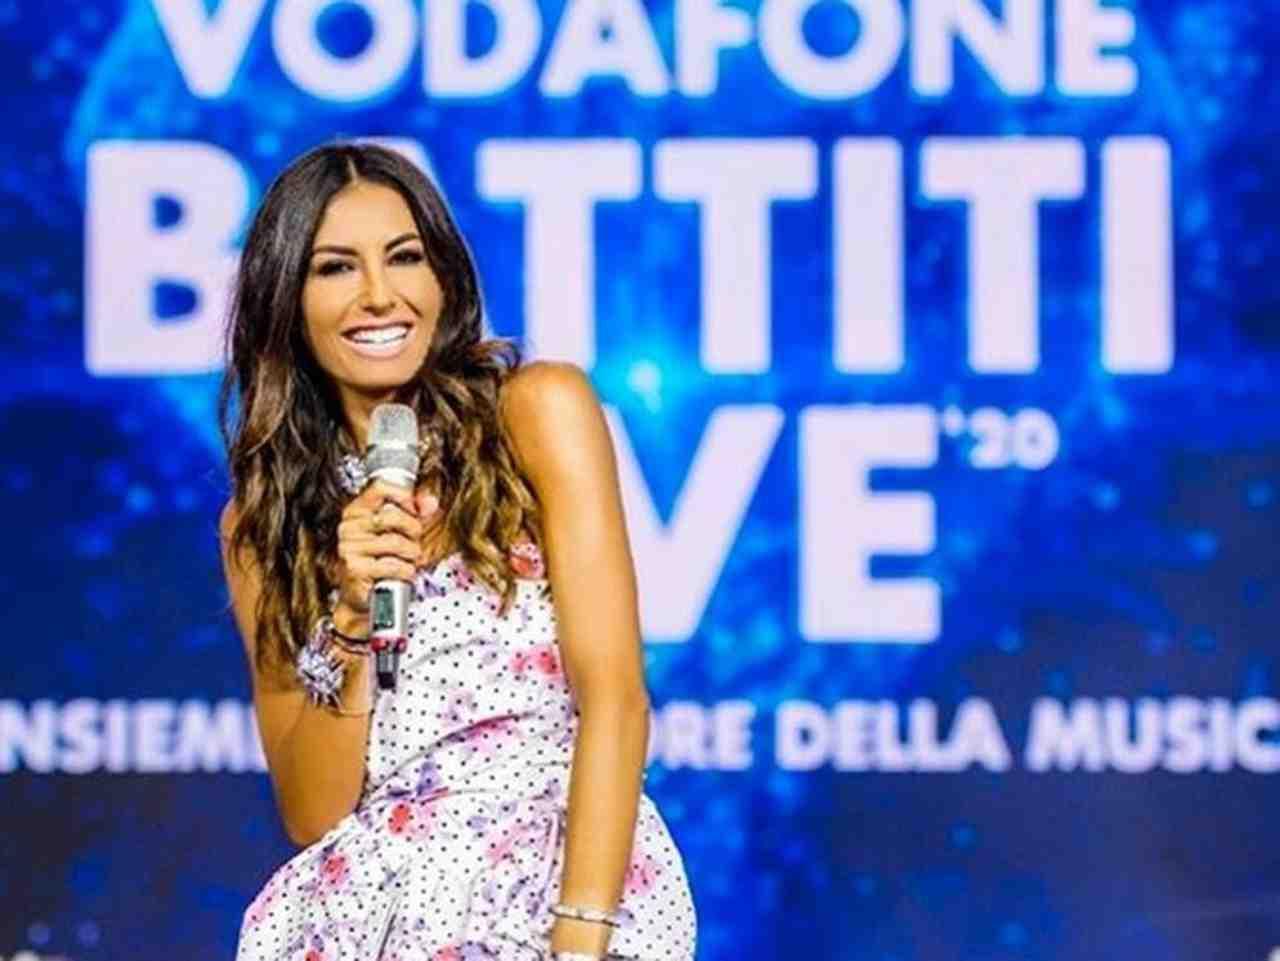 La conduttrice di Battiti Live, Elisabetta Gregoraci (foto Rai).